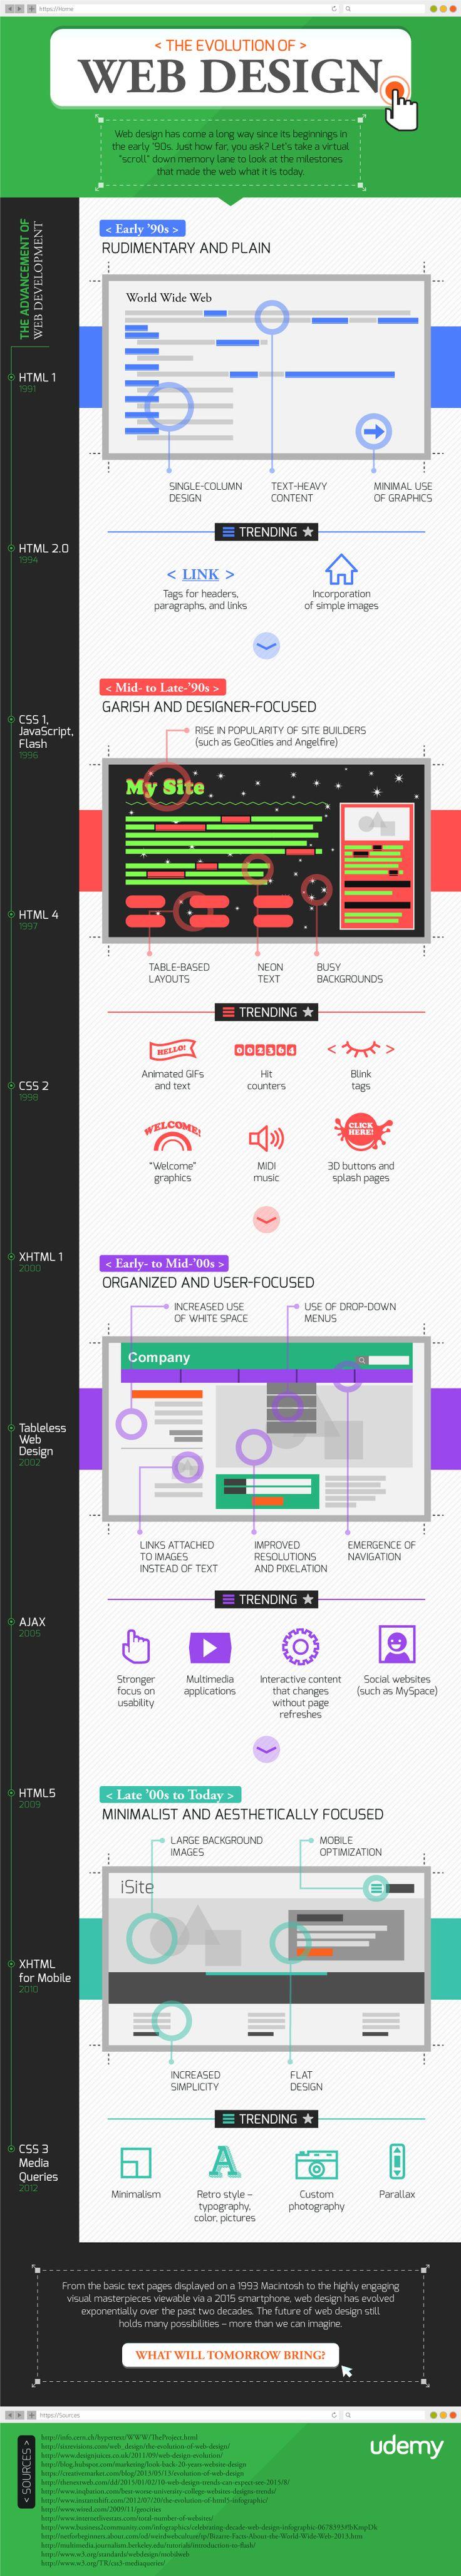 The Evolution of Web Design #infographic #WebDesign